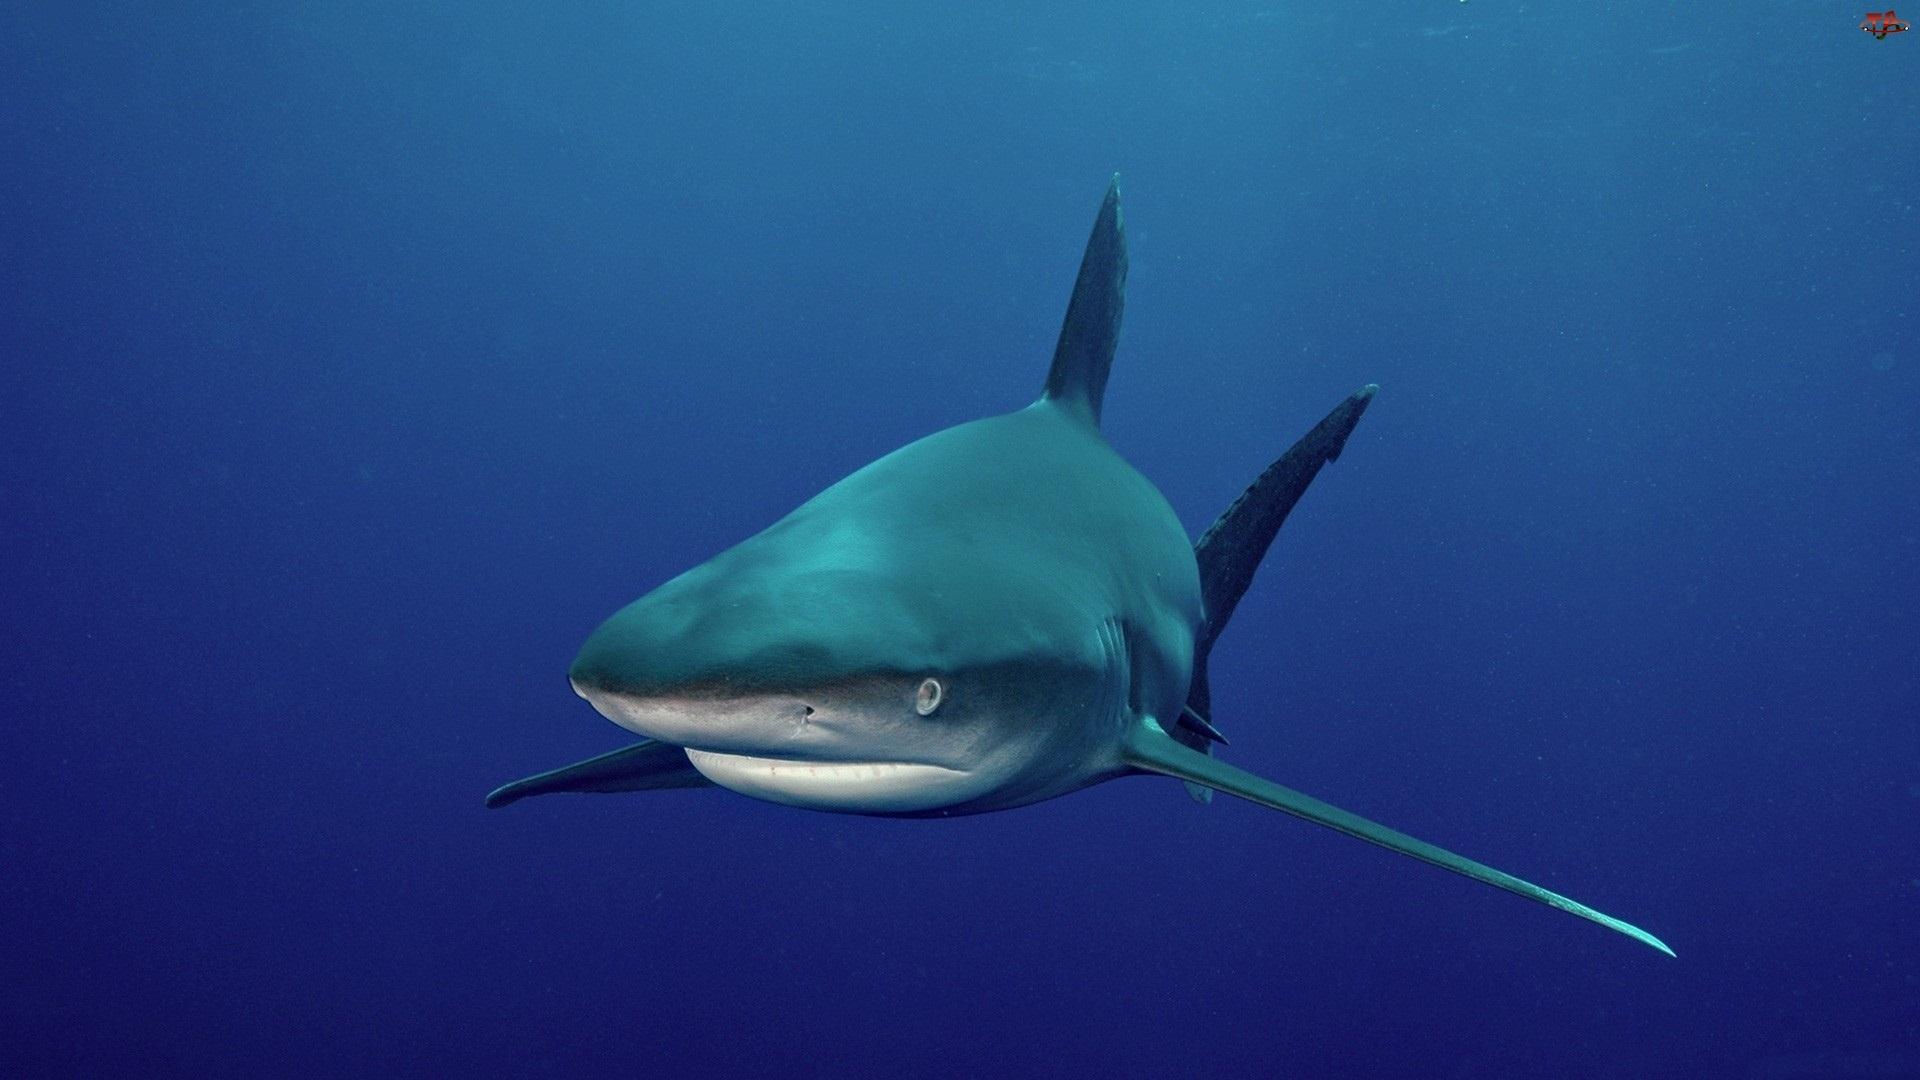 Rekin, Głębiny, Morskie